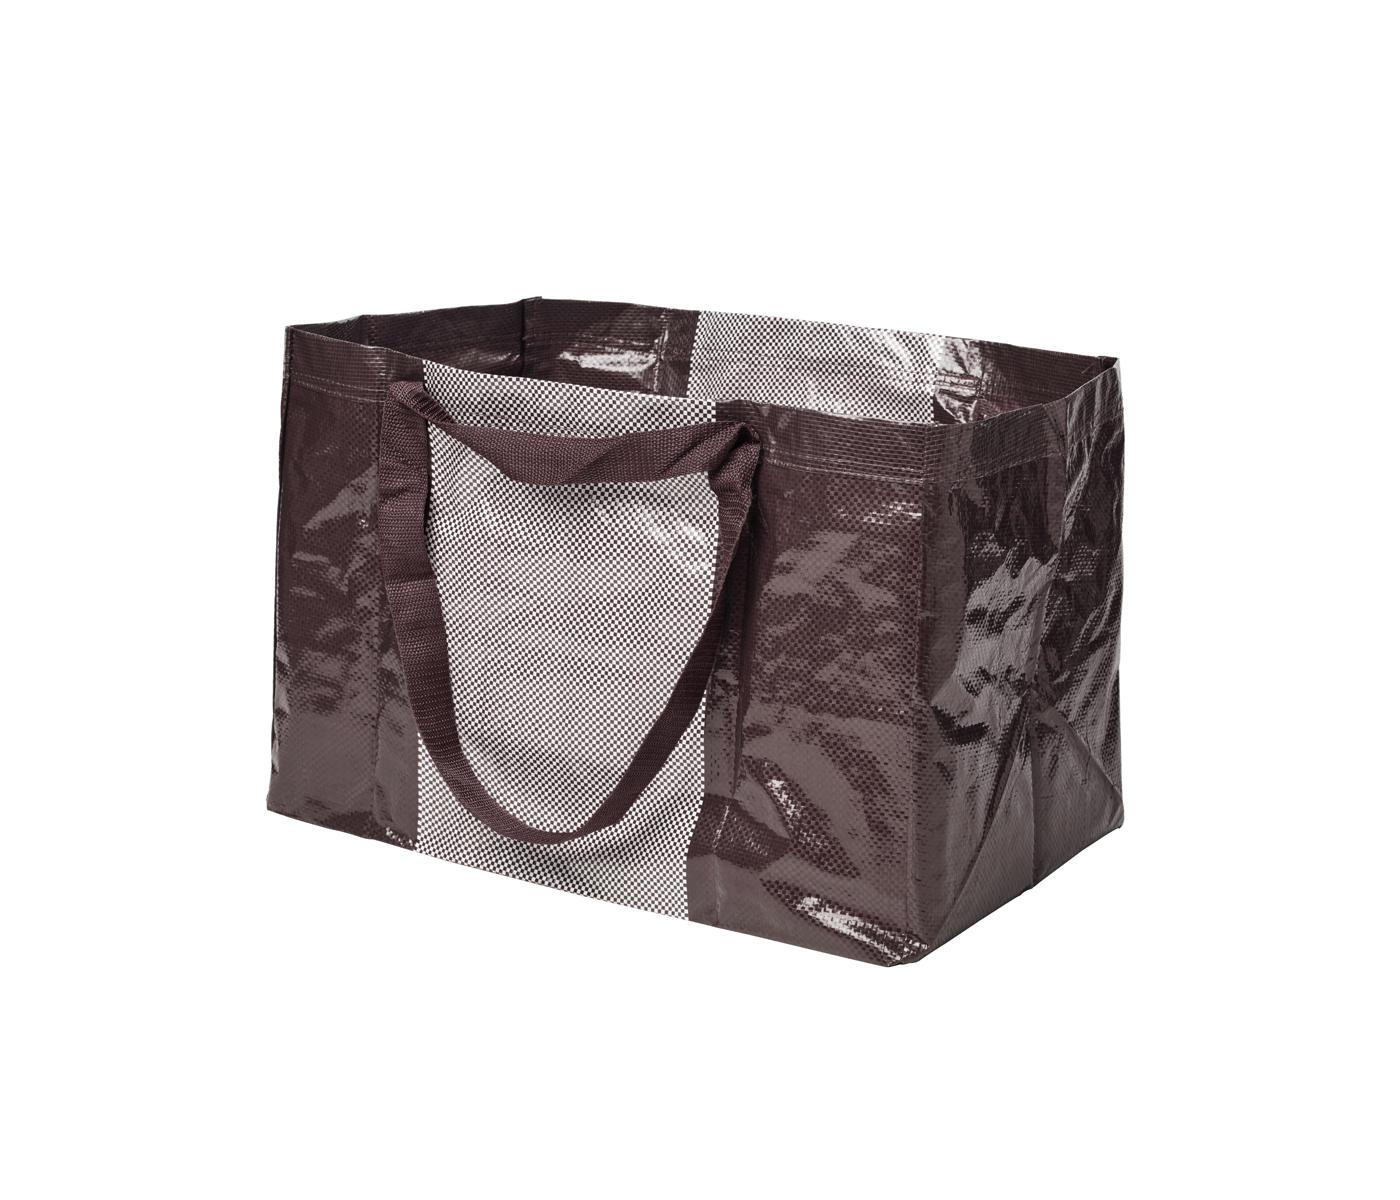 Ypperlig Tasche Aus Polypropylen Ca. 2 Euro